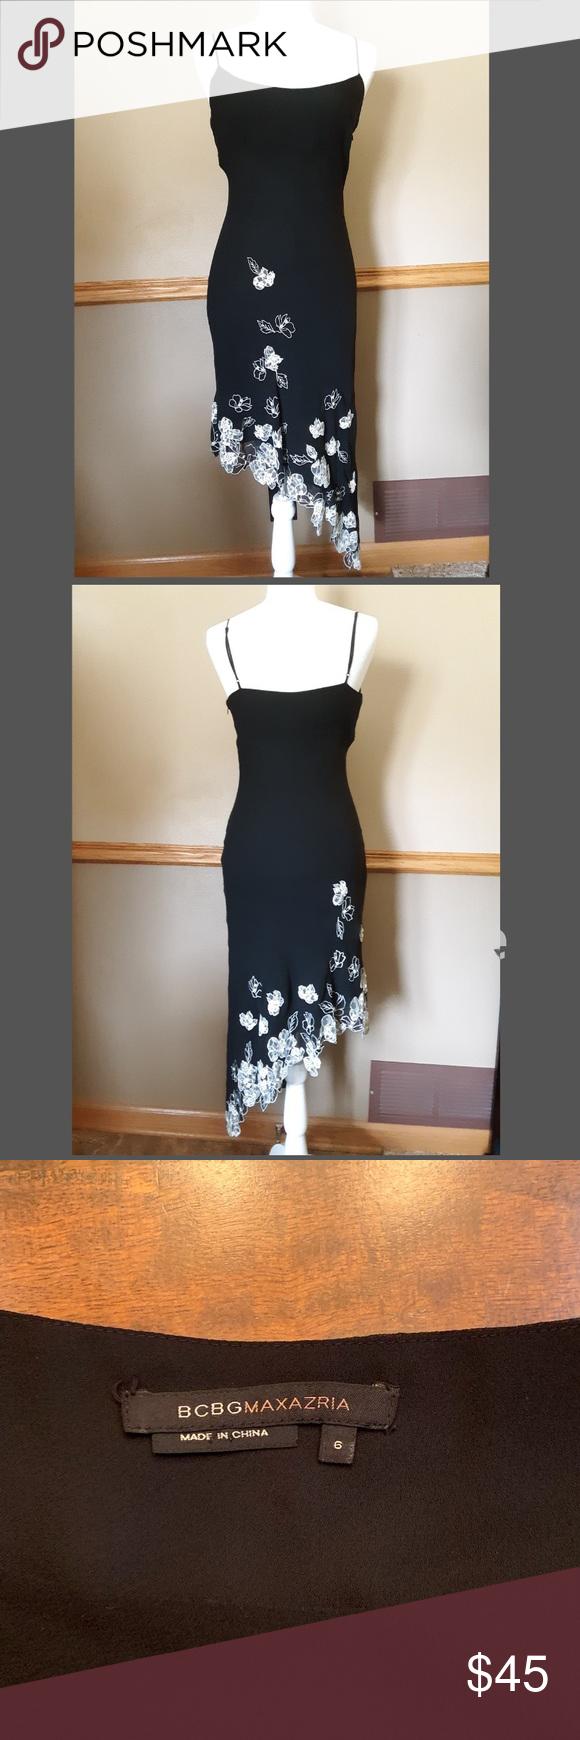 Bcbgmaxazria Black Dress Asymmetrical Black Dress Dresses Black Dress [ 1740 x 580 Pixel ]